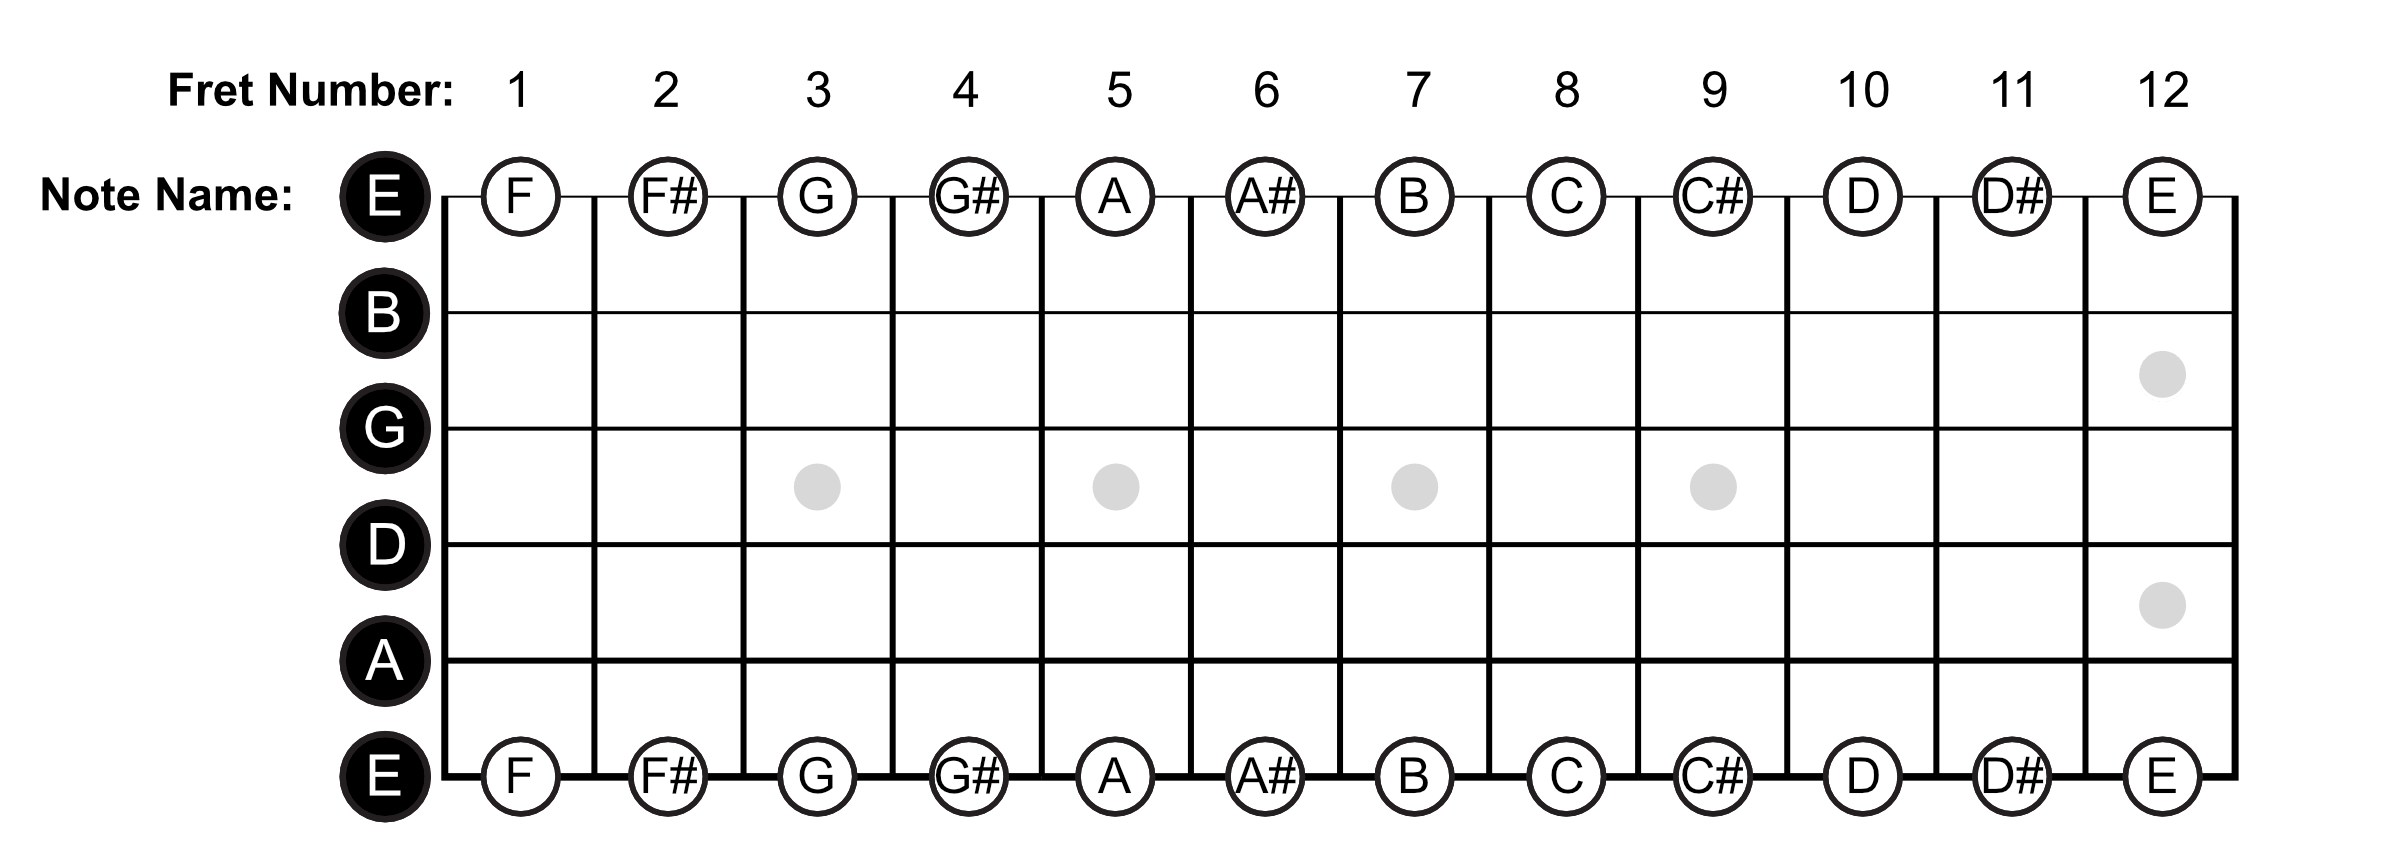 E String Note Names